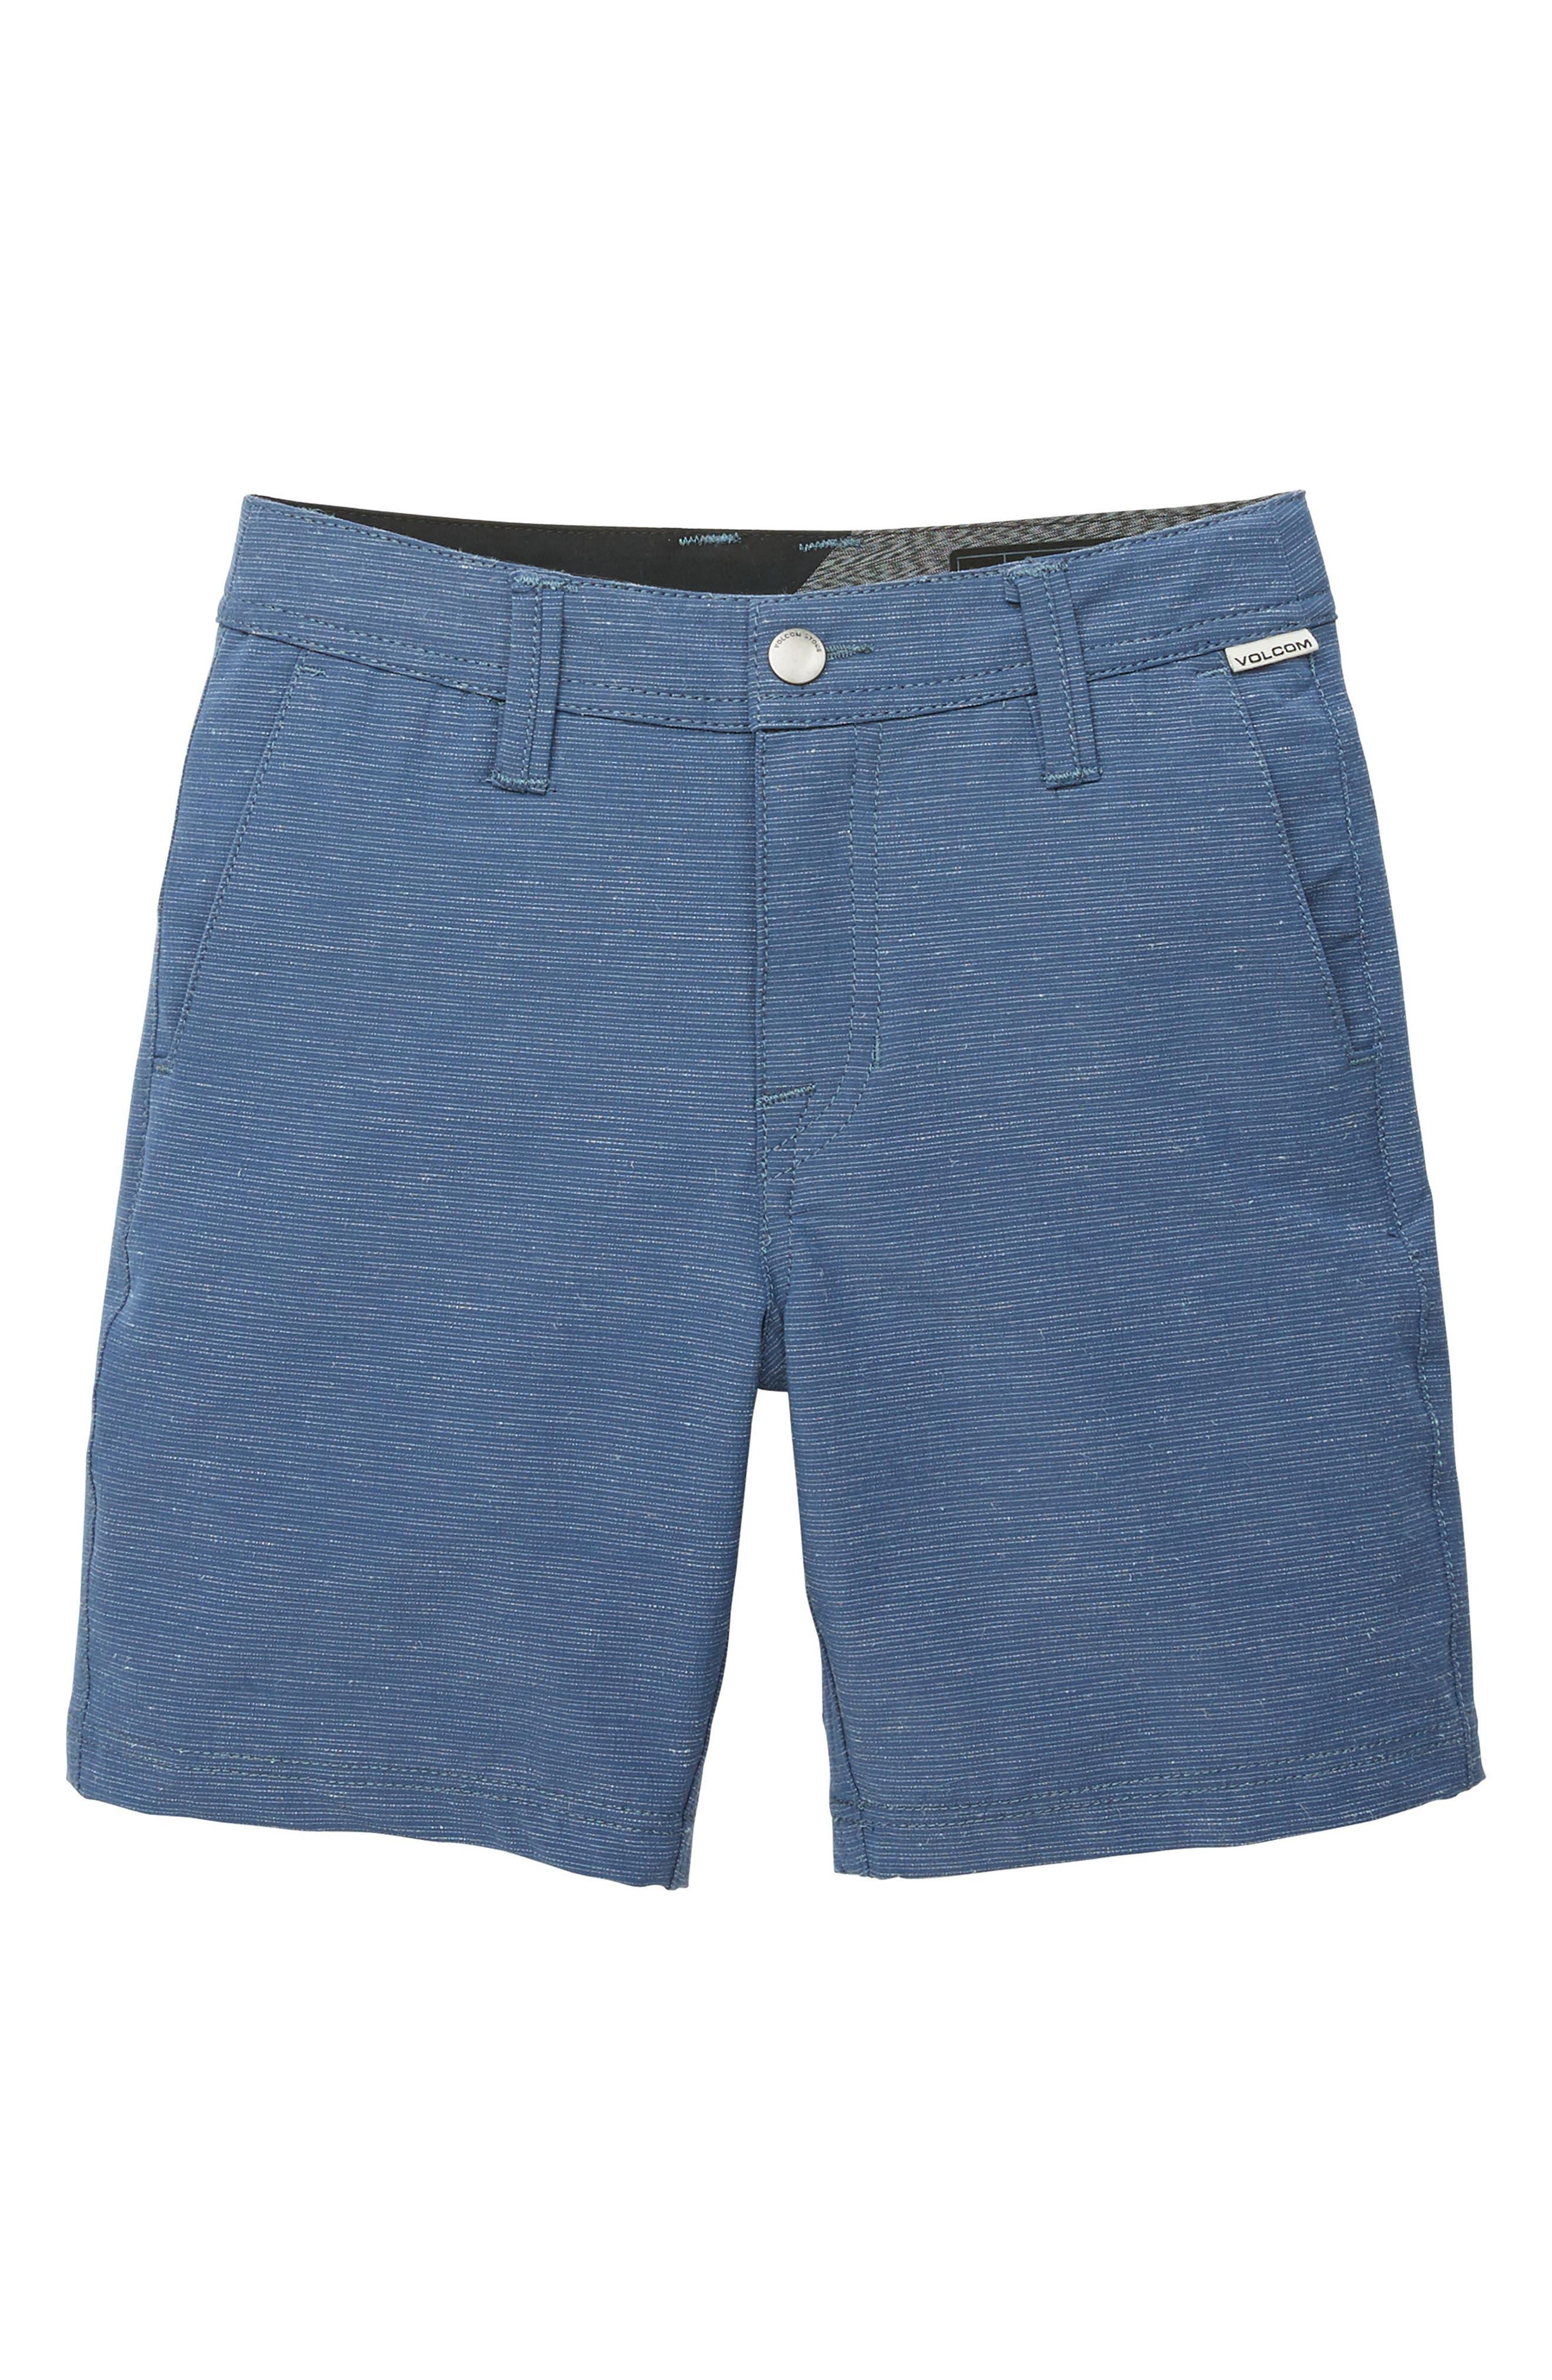 Surf N' Turf Slub Hybrid Shorts,                         Main,                         color, DEEP WATER